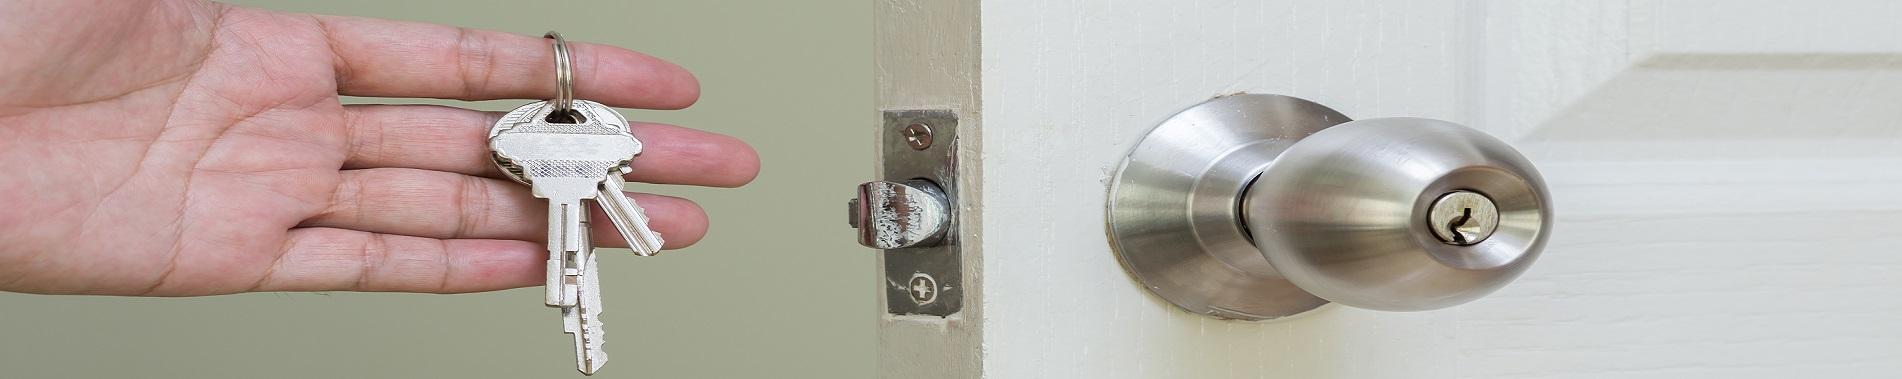 Locksmith Arvada CO - Denver Experts